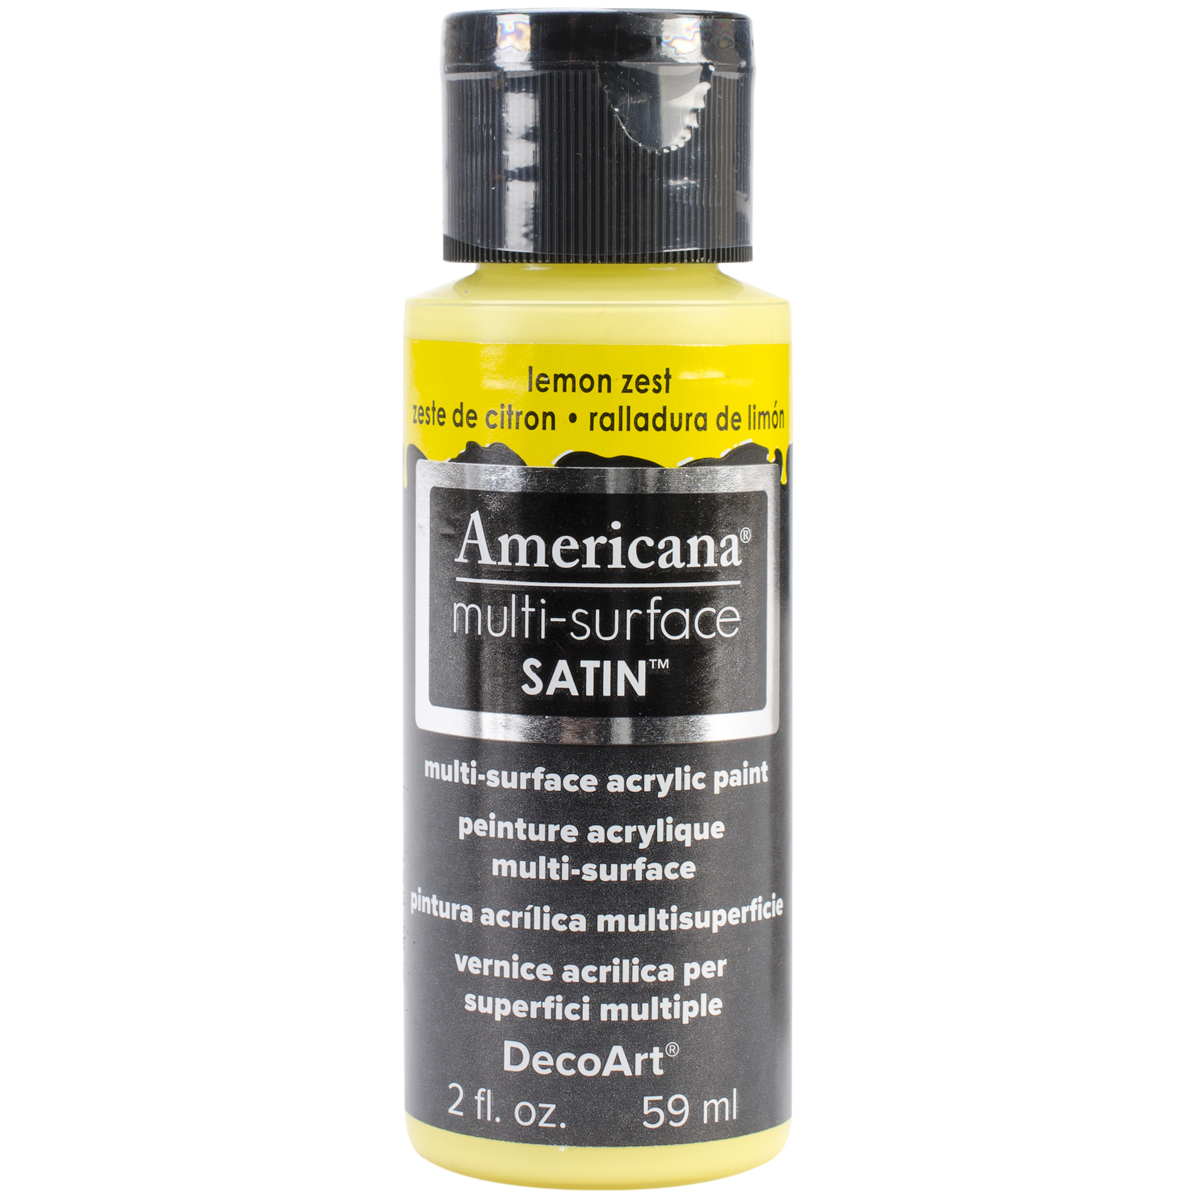 Americana Multi-Surface Satin Acrylic Paint 2oz-Lemon Zest